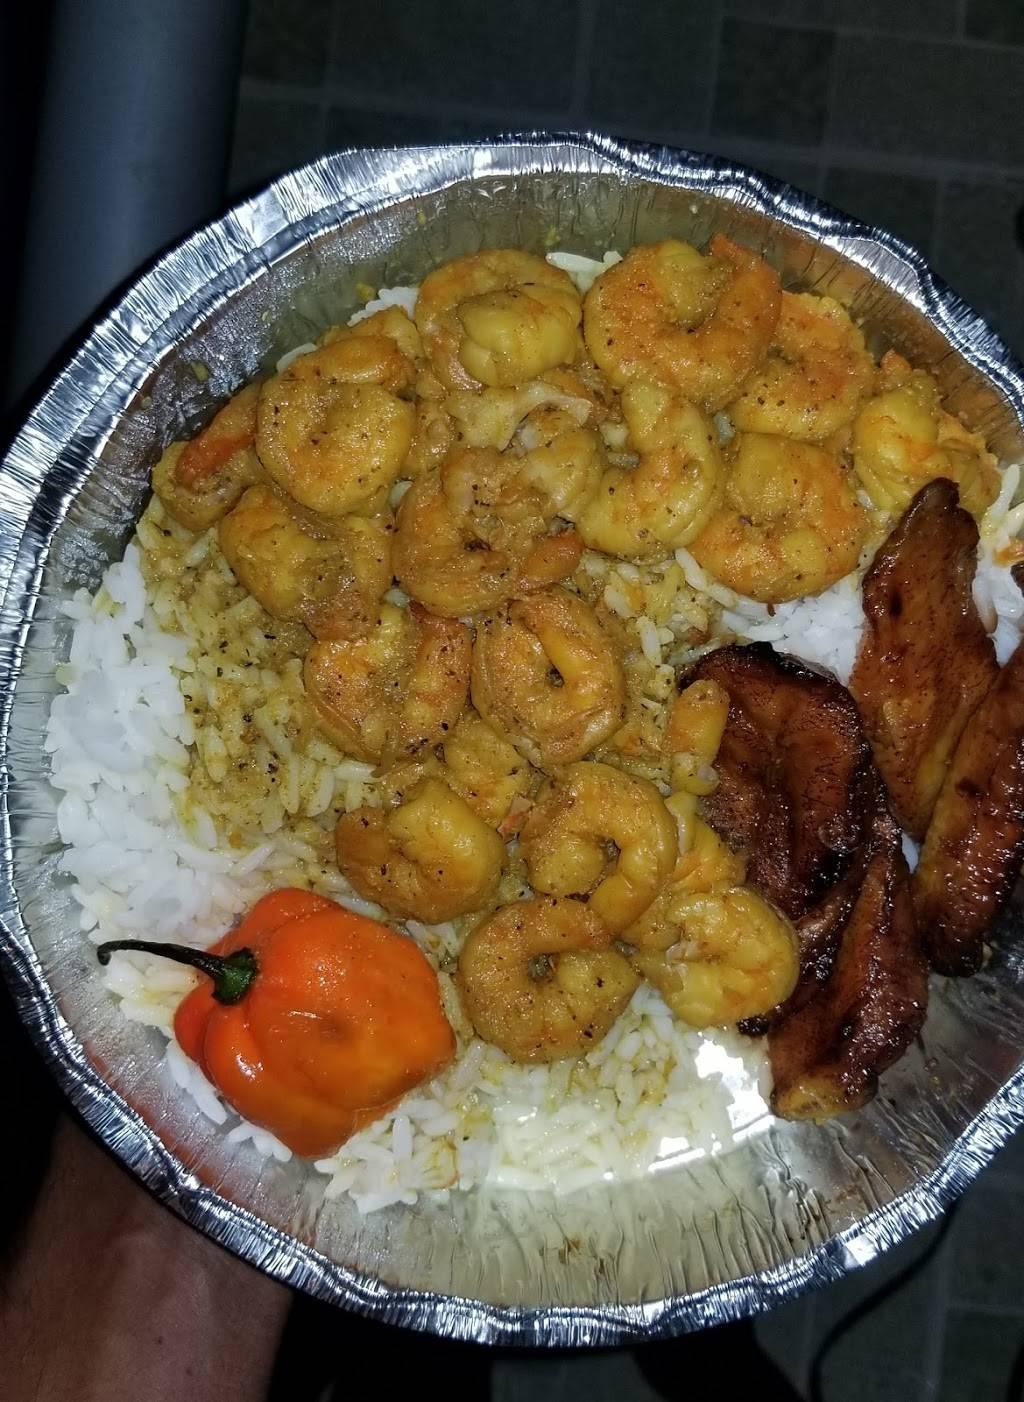 Island Bites | restaurant | 2107 1st Avenue, New York, NY 10029, USA | 6468508855 OR +1 646-850-8855